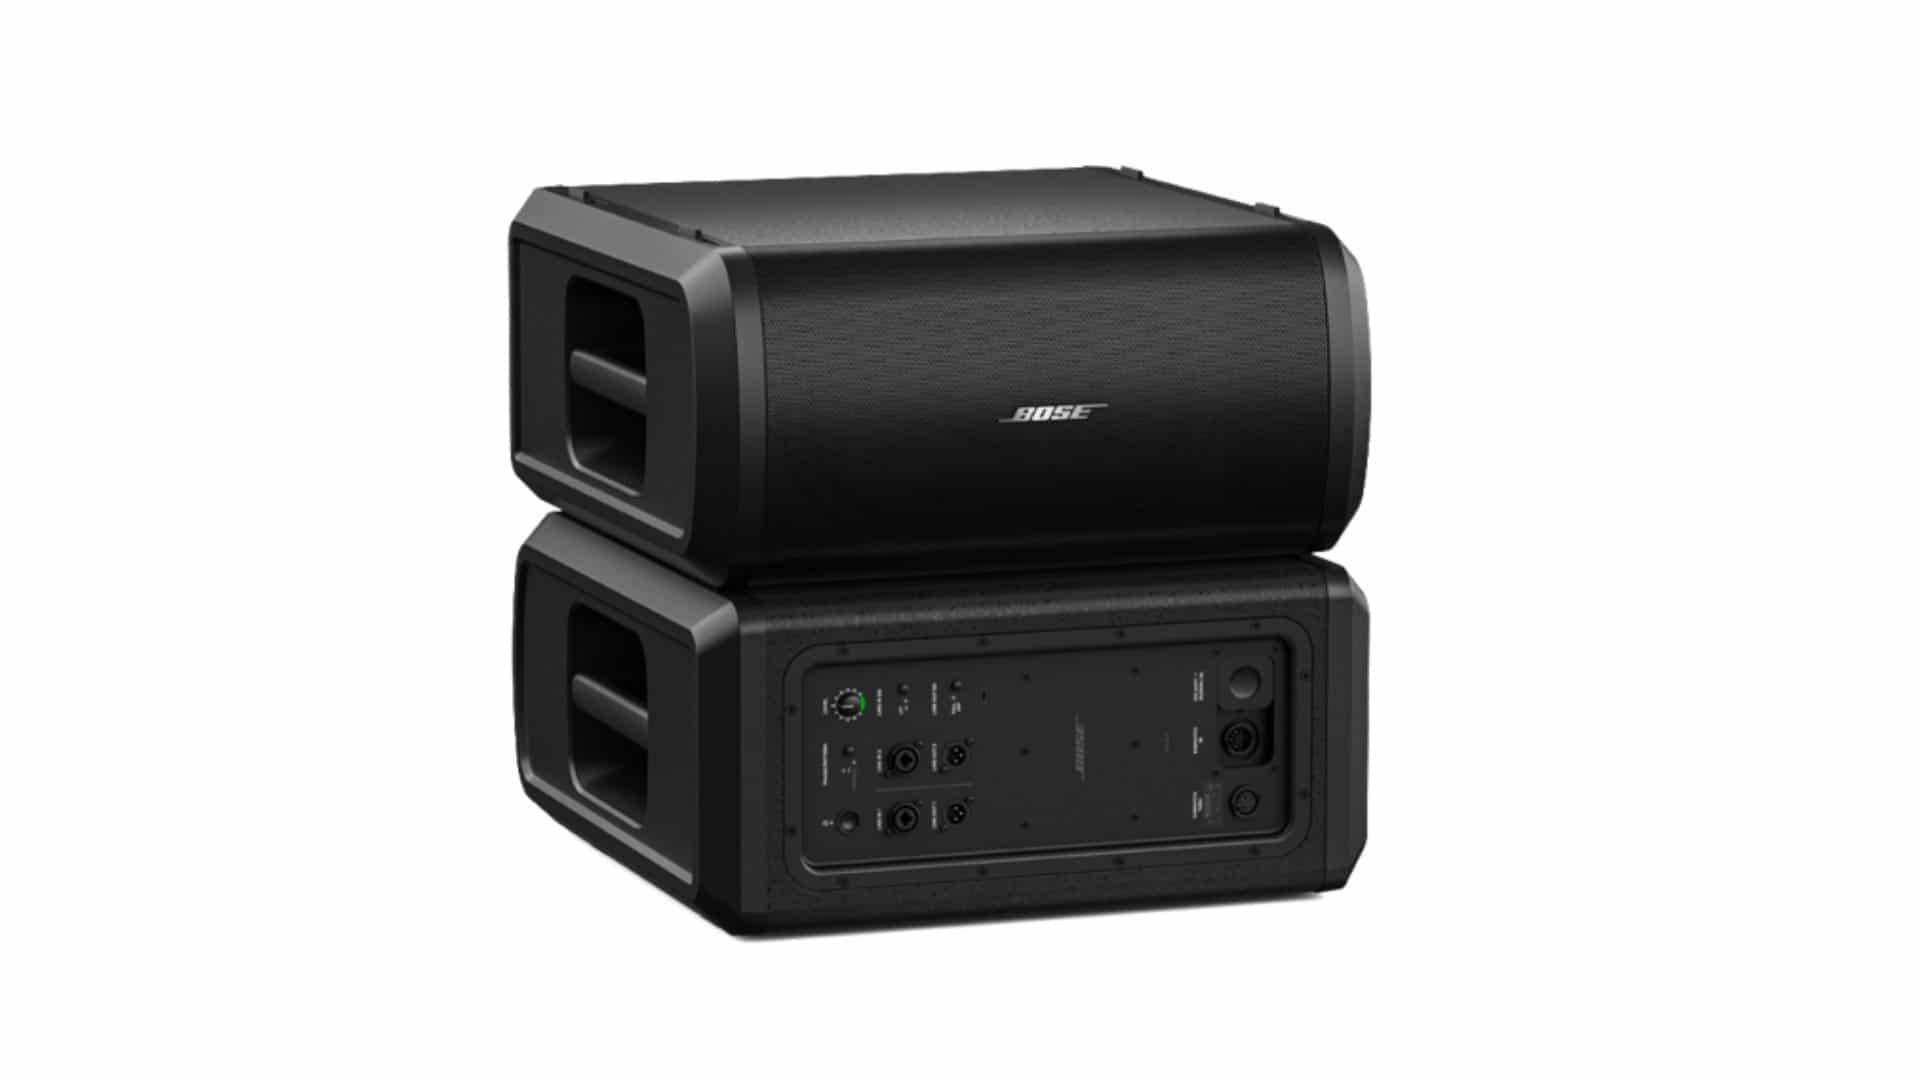 Bose S1 Sub